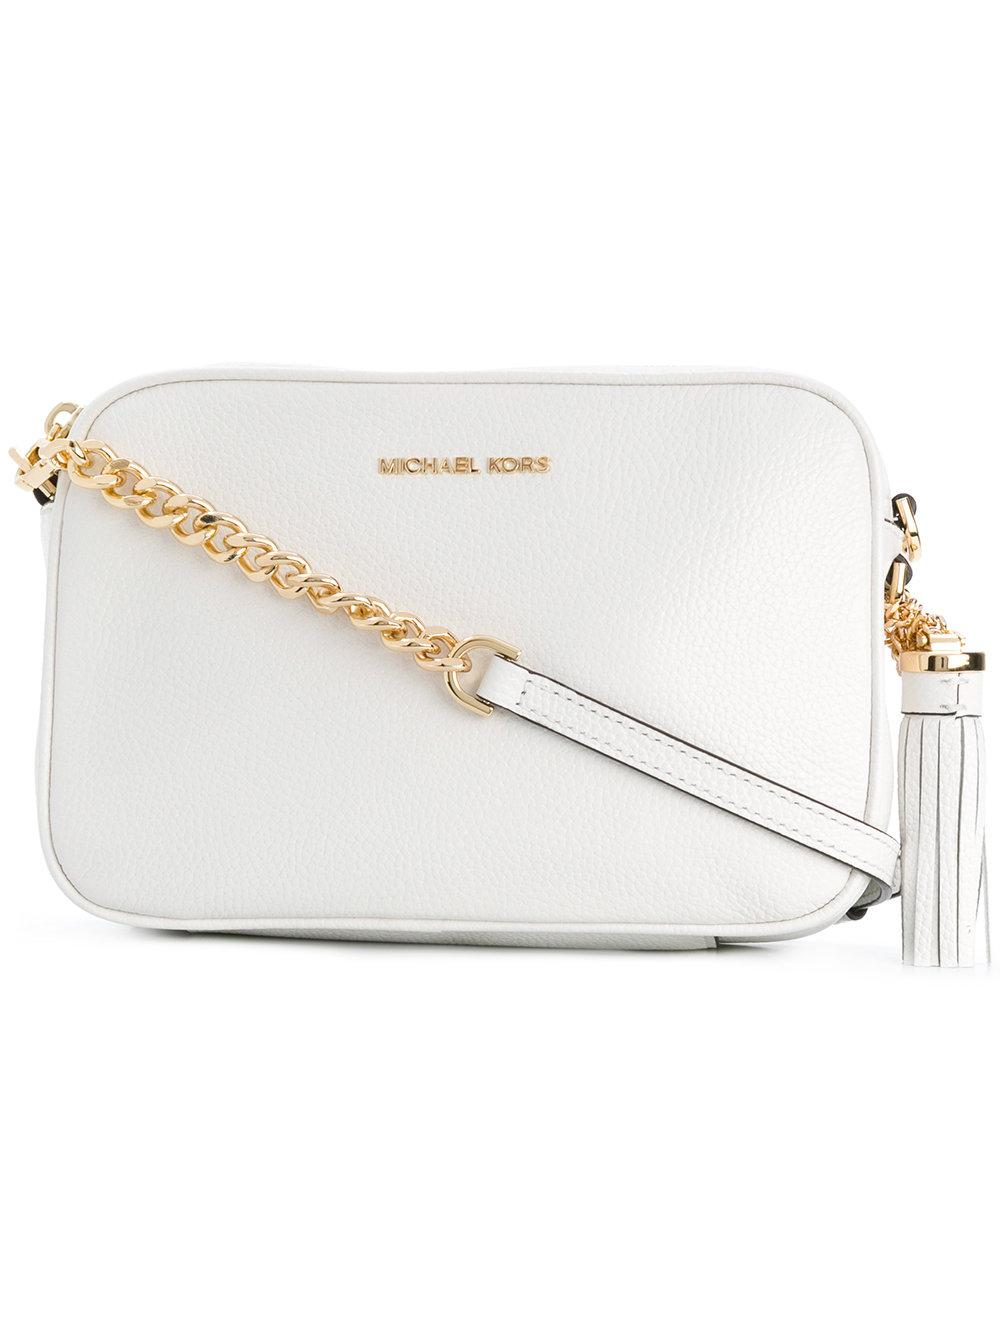 d12903d1b979 Michael Michael Kors Ginny Crossbody Bag - Weiß In White | ModeSens